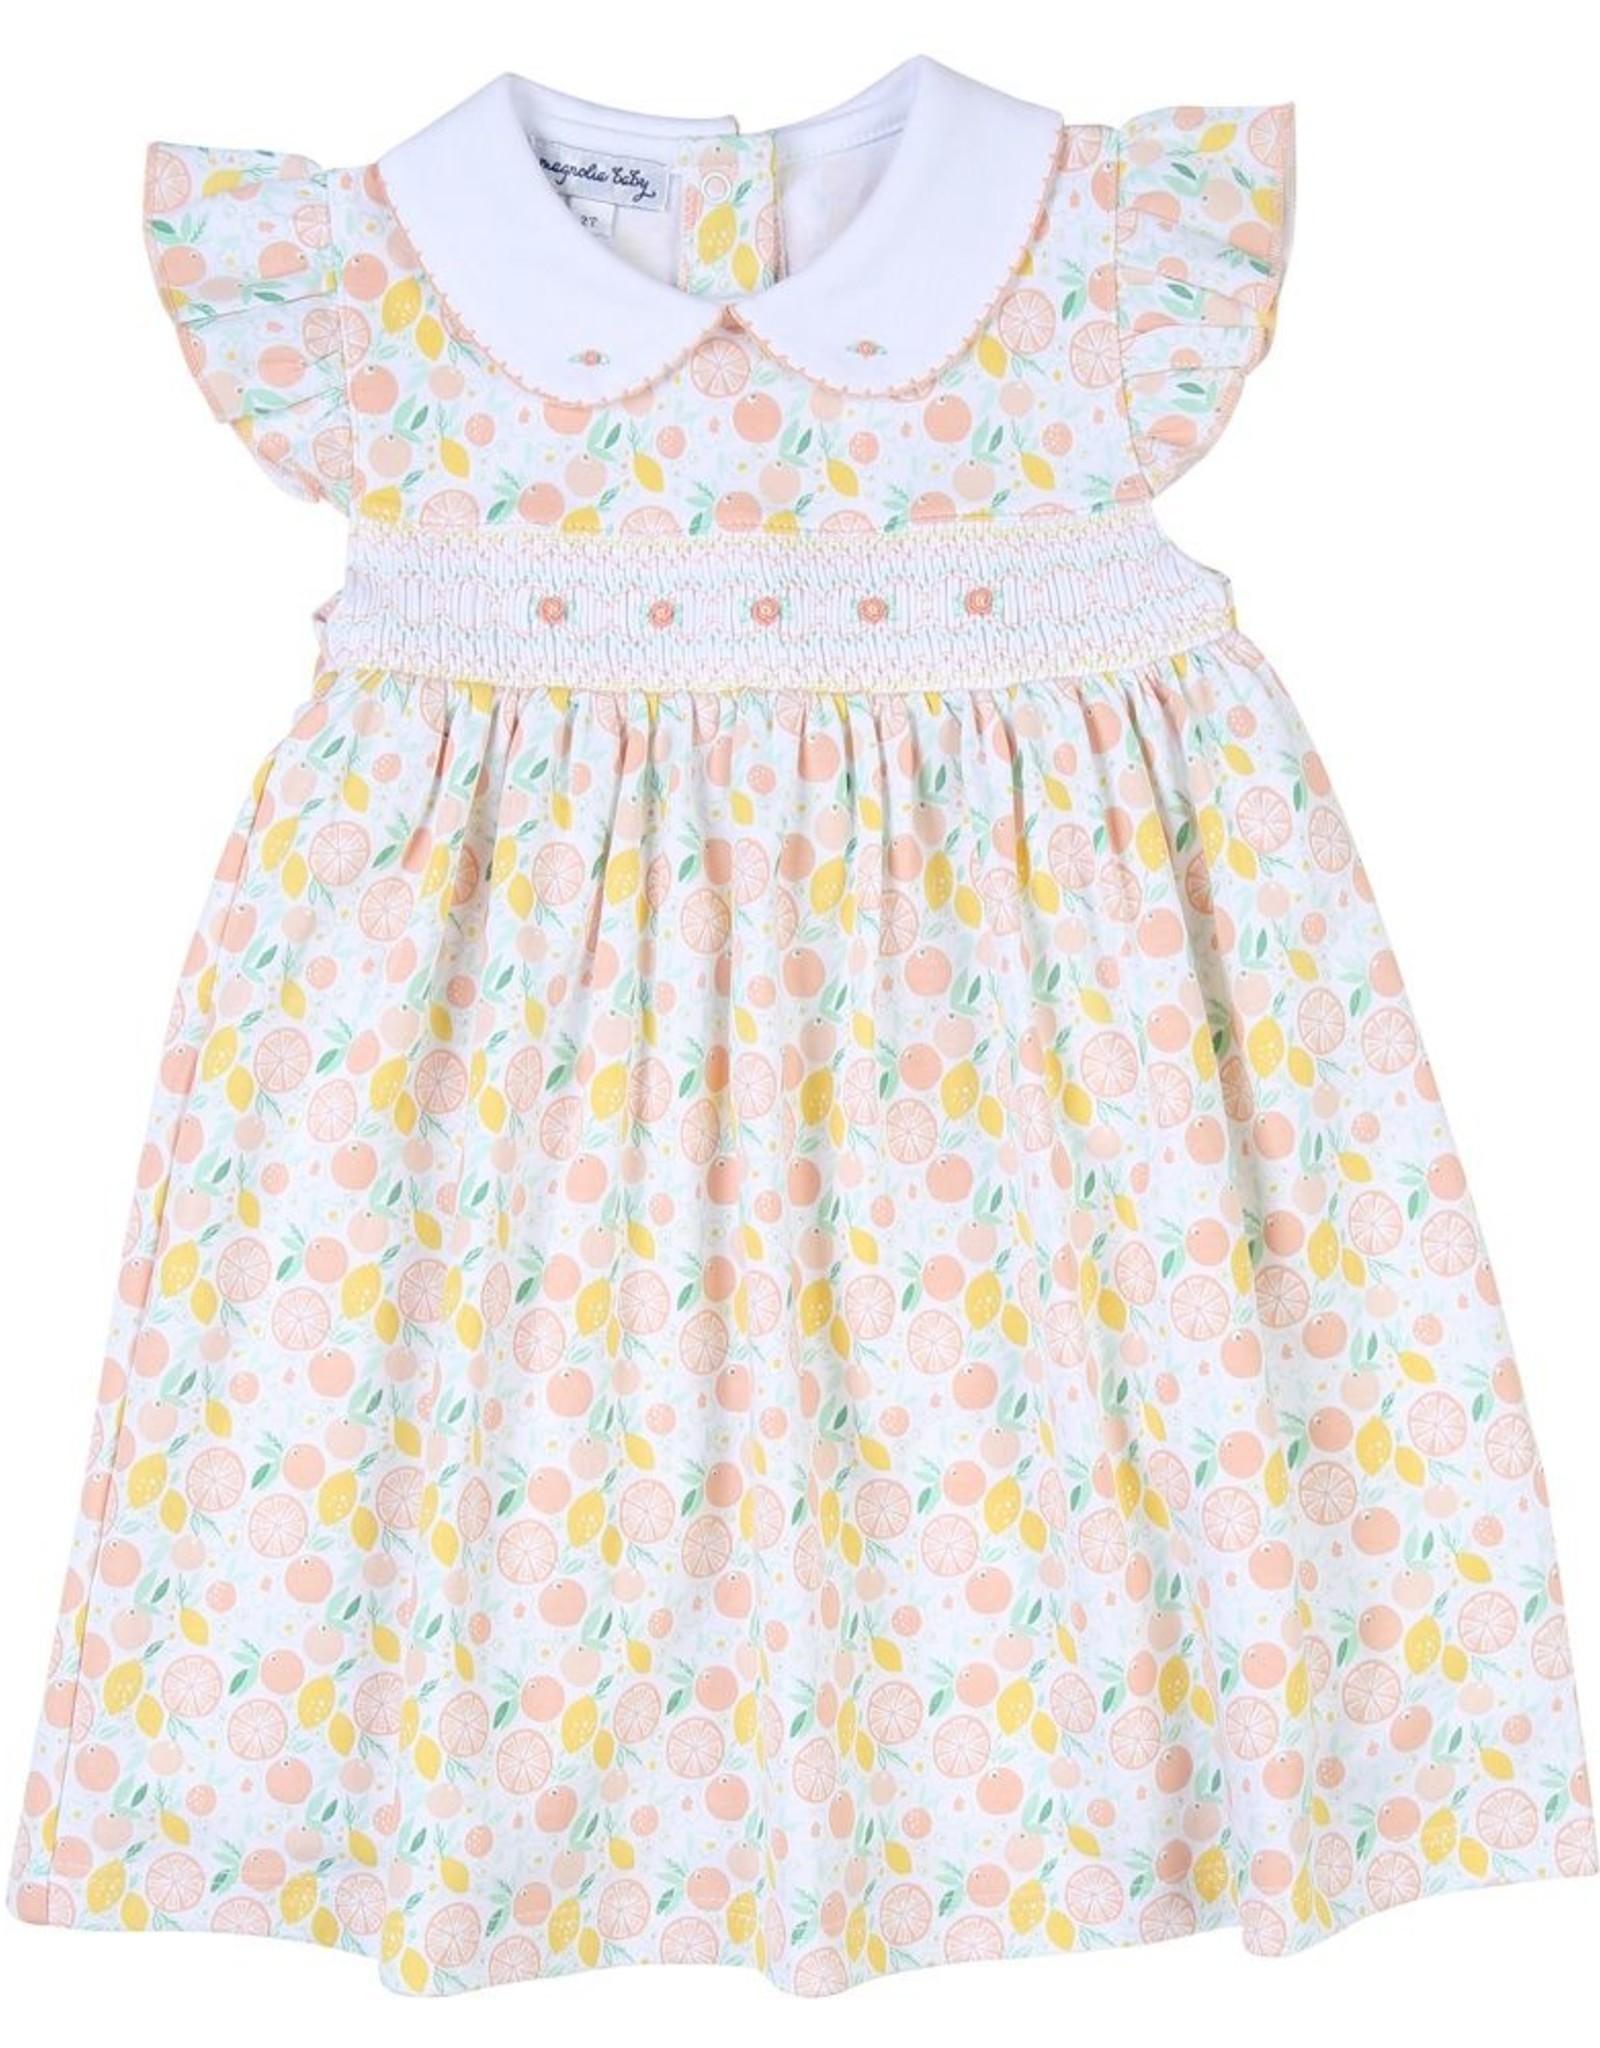 Magnolia Baby Citrus Bouquet Smocked Printed Collar Dress